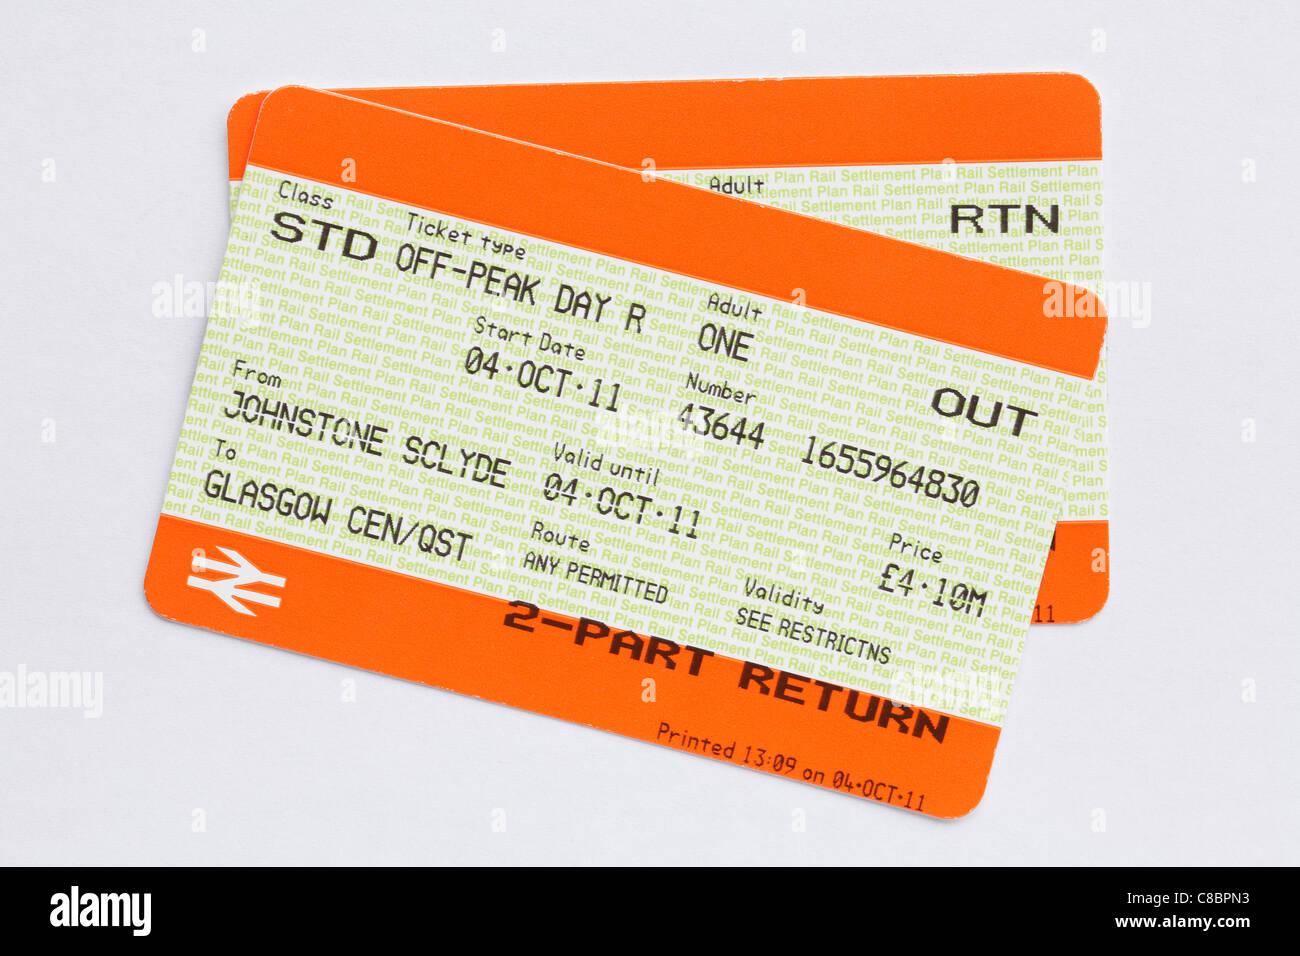 Vat On Train Tickets >> Train Ticket Scotland Uk Stock Photo 39597295 Alamy